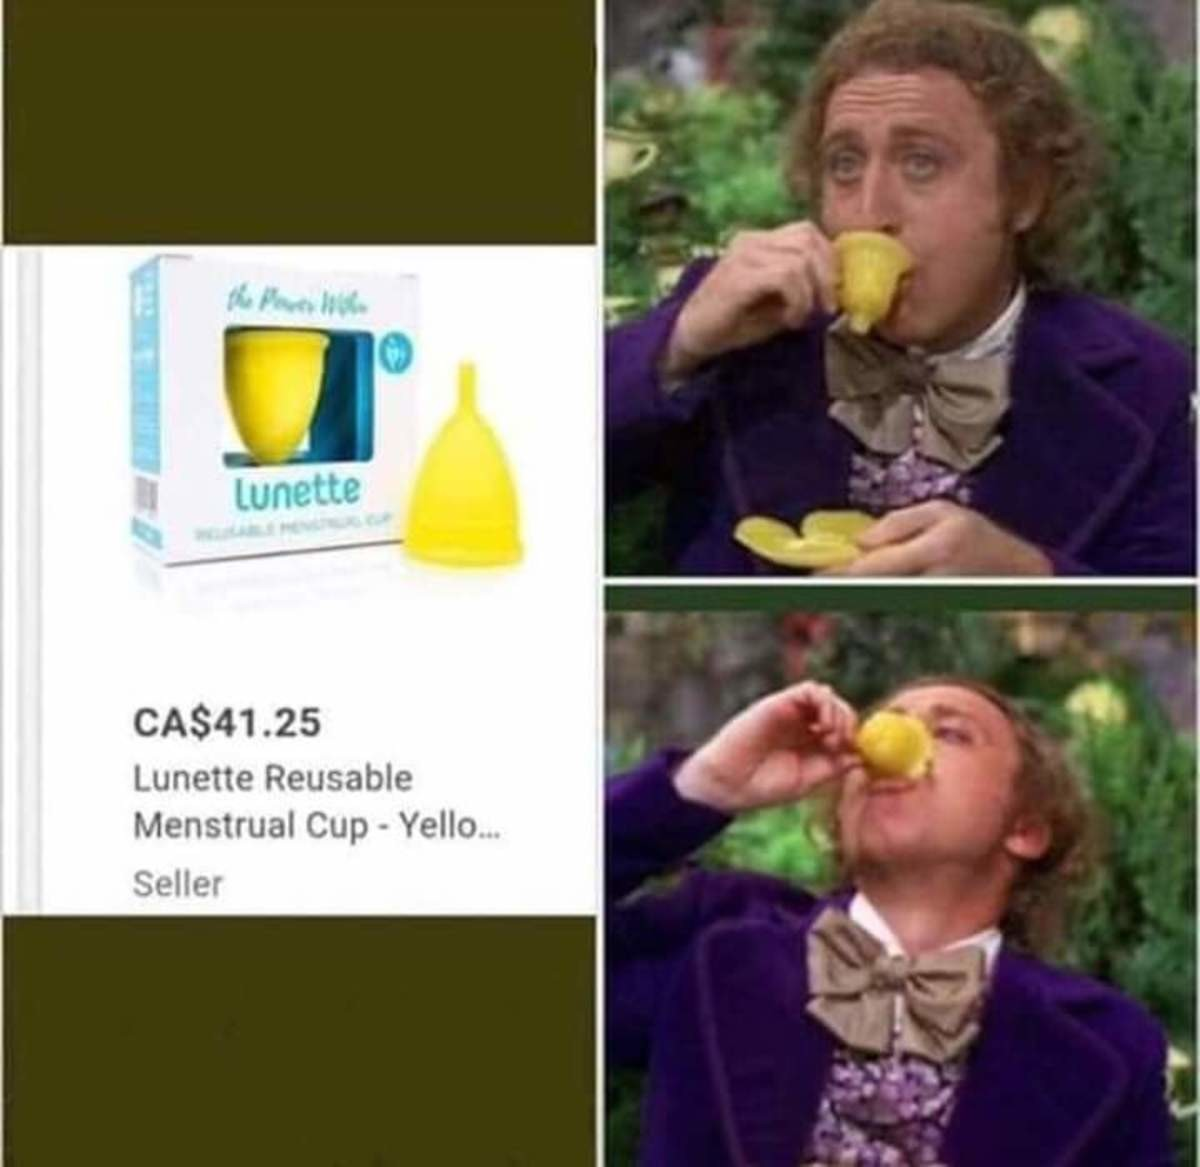 Take a sip. .. bruh